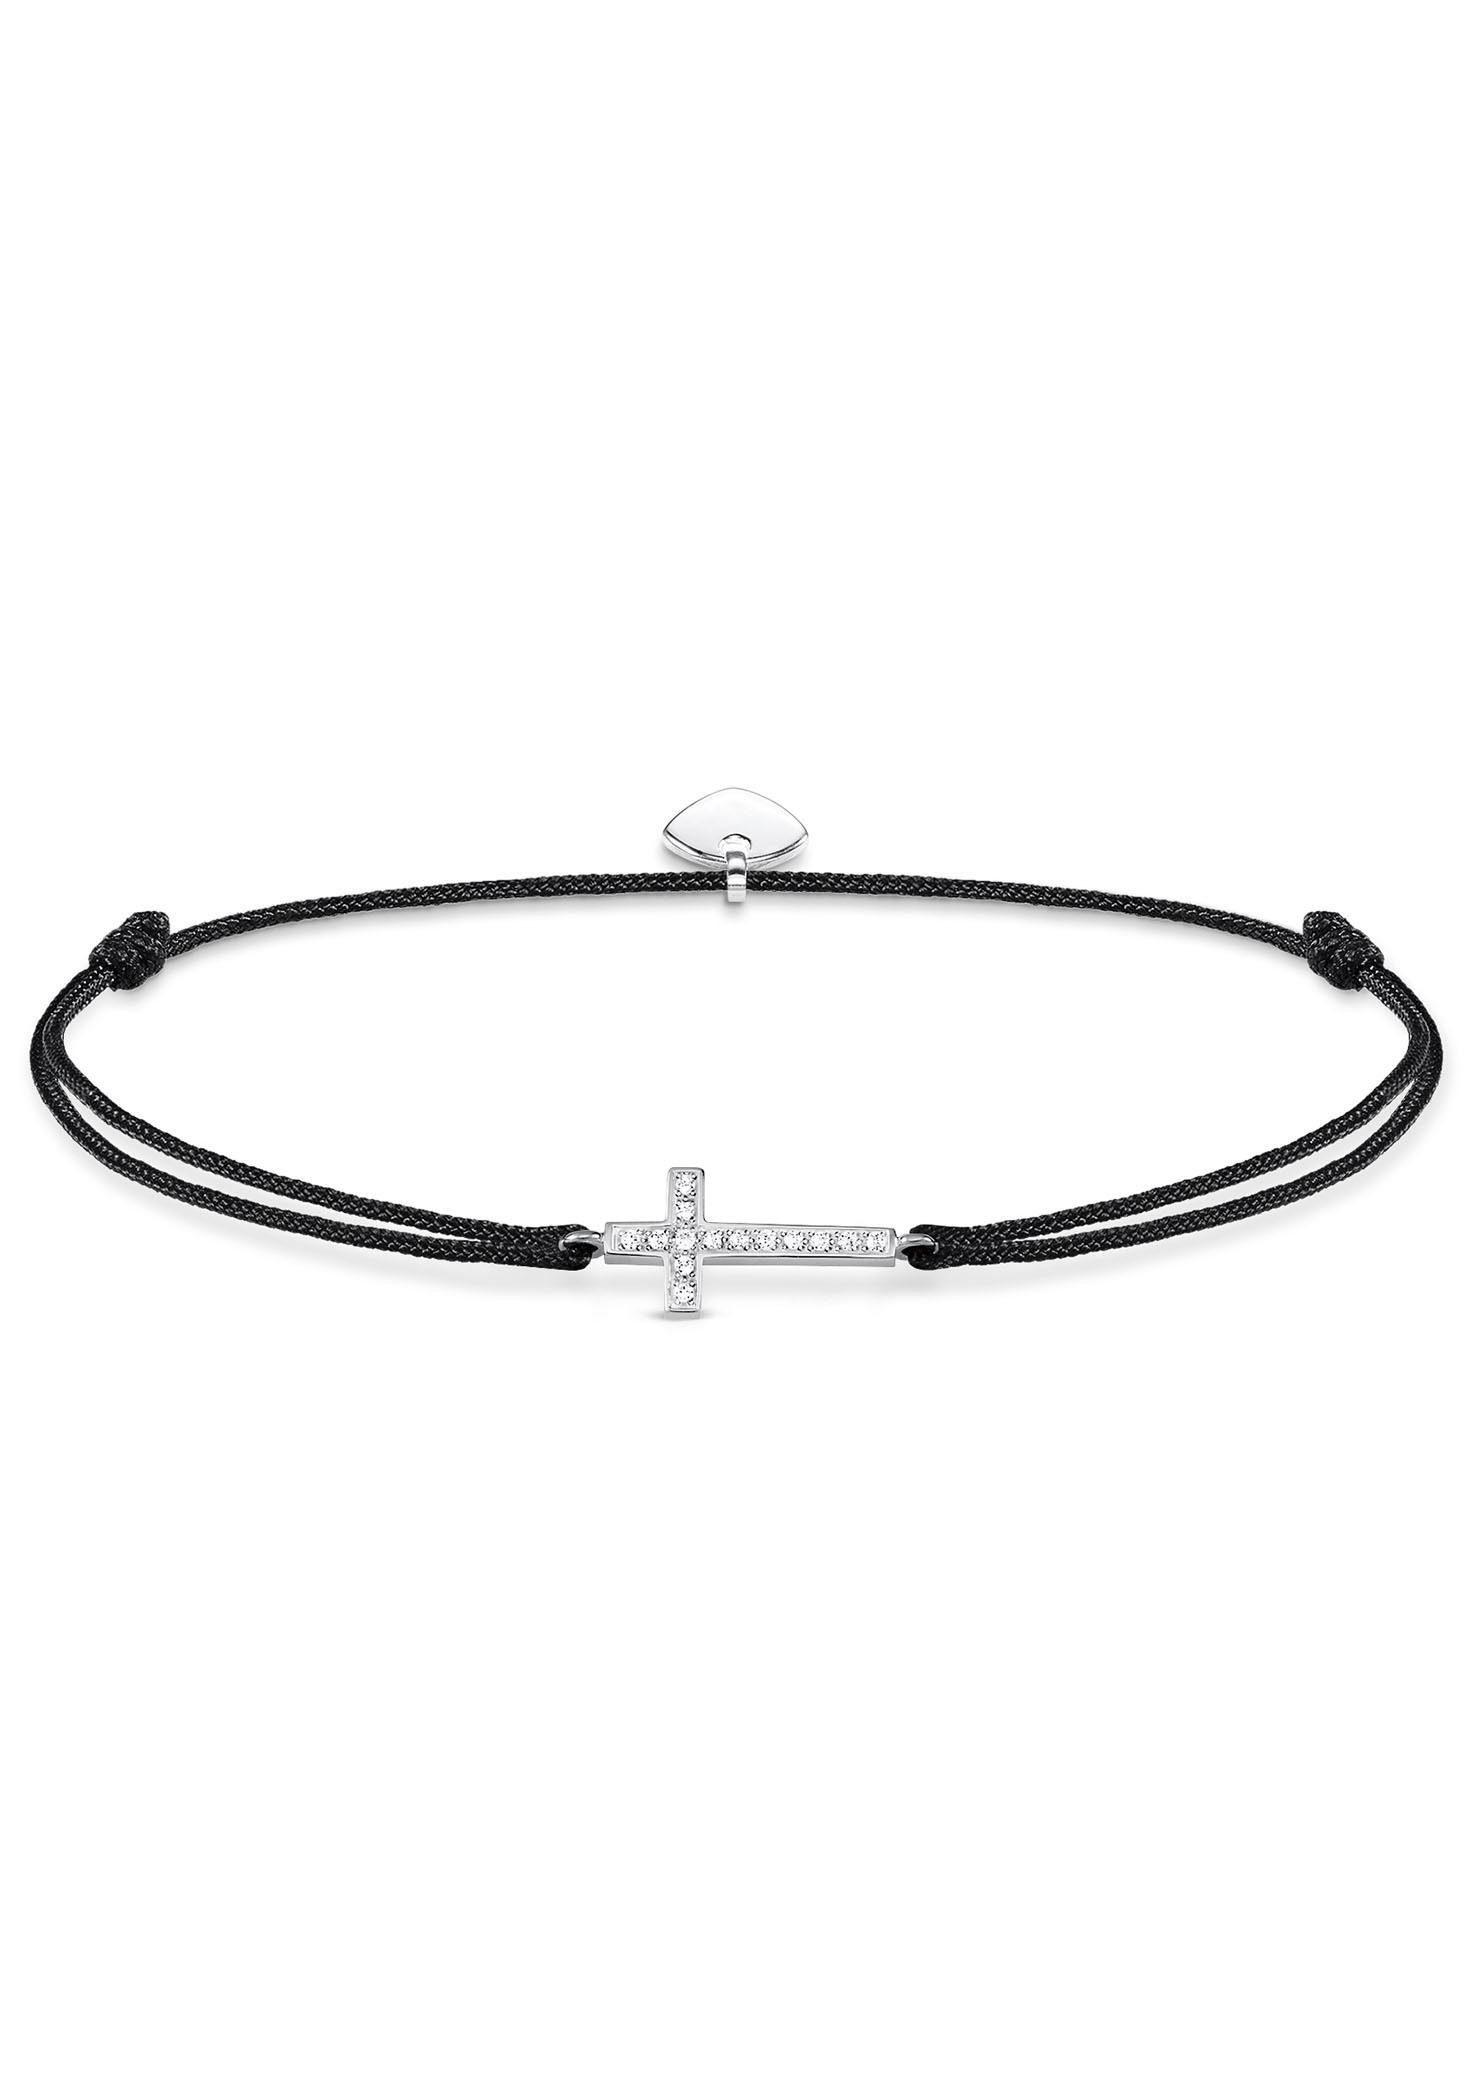 Zirkonia Online Armband Thomas Kaufen Sabo l20v« SecretLs013 401 »kreuzLittle Mit 11 Y2IWDH9E